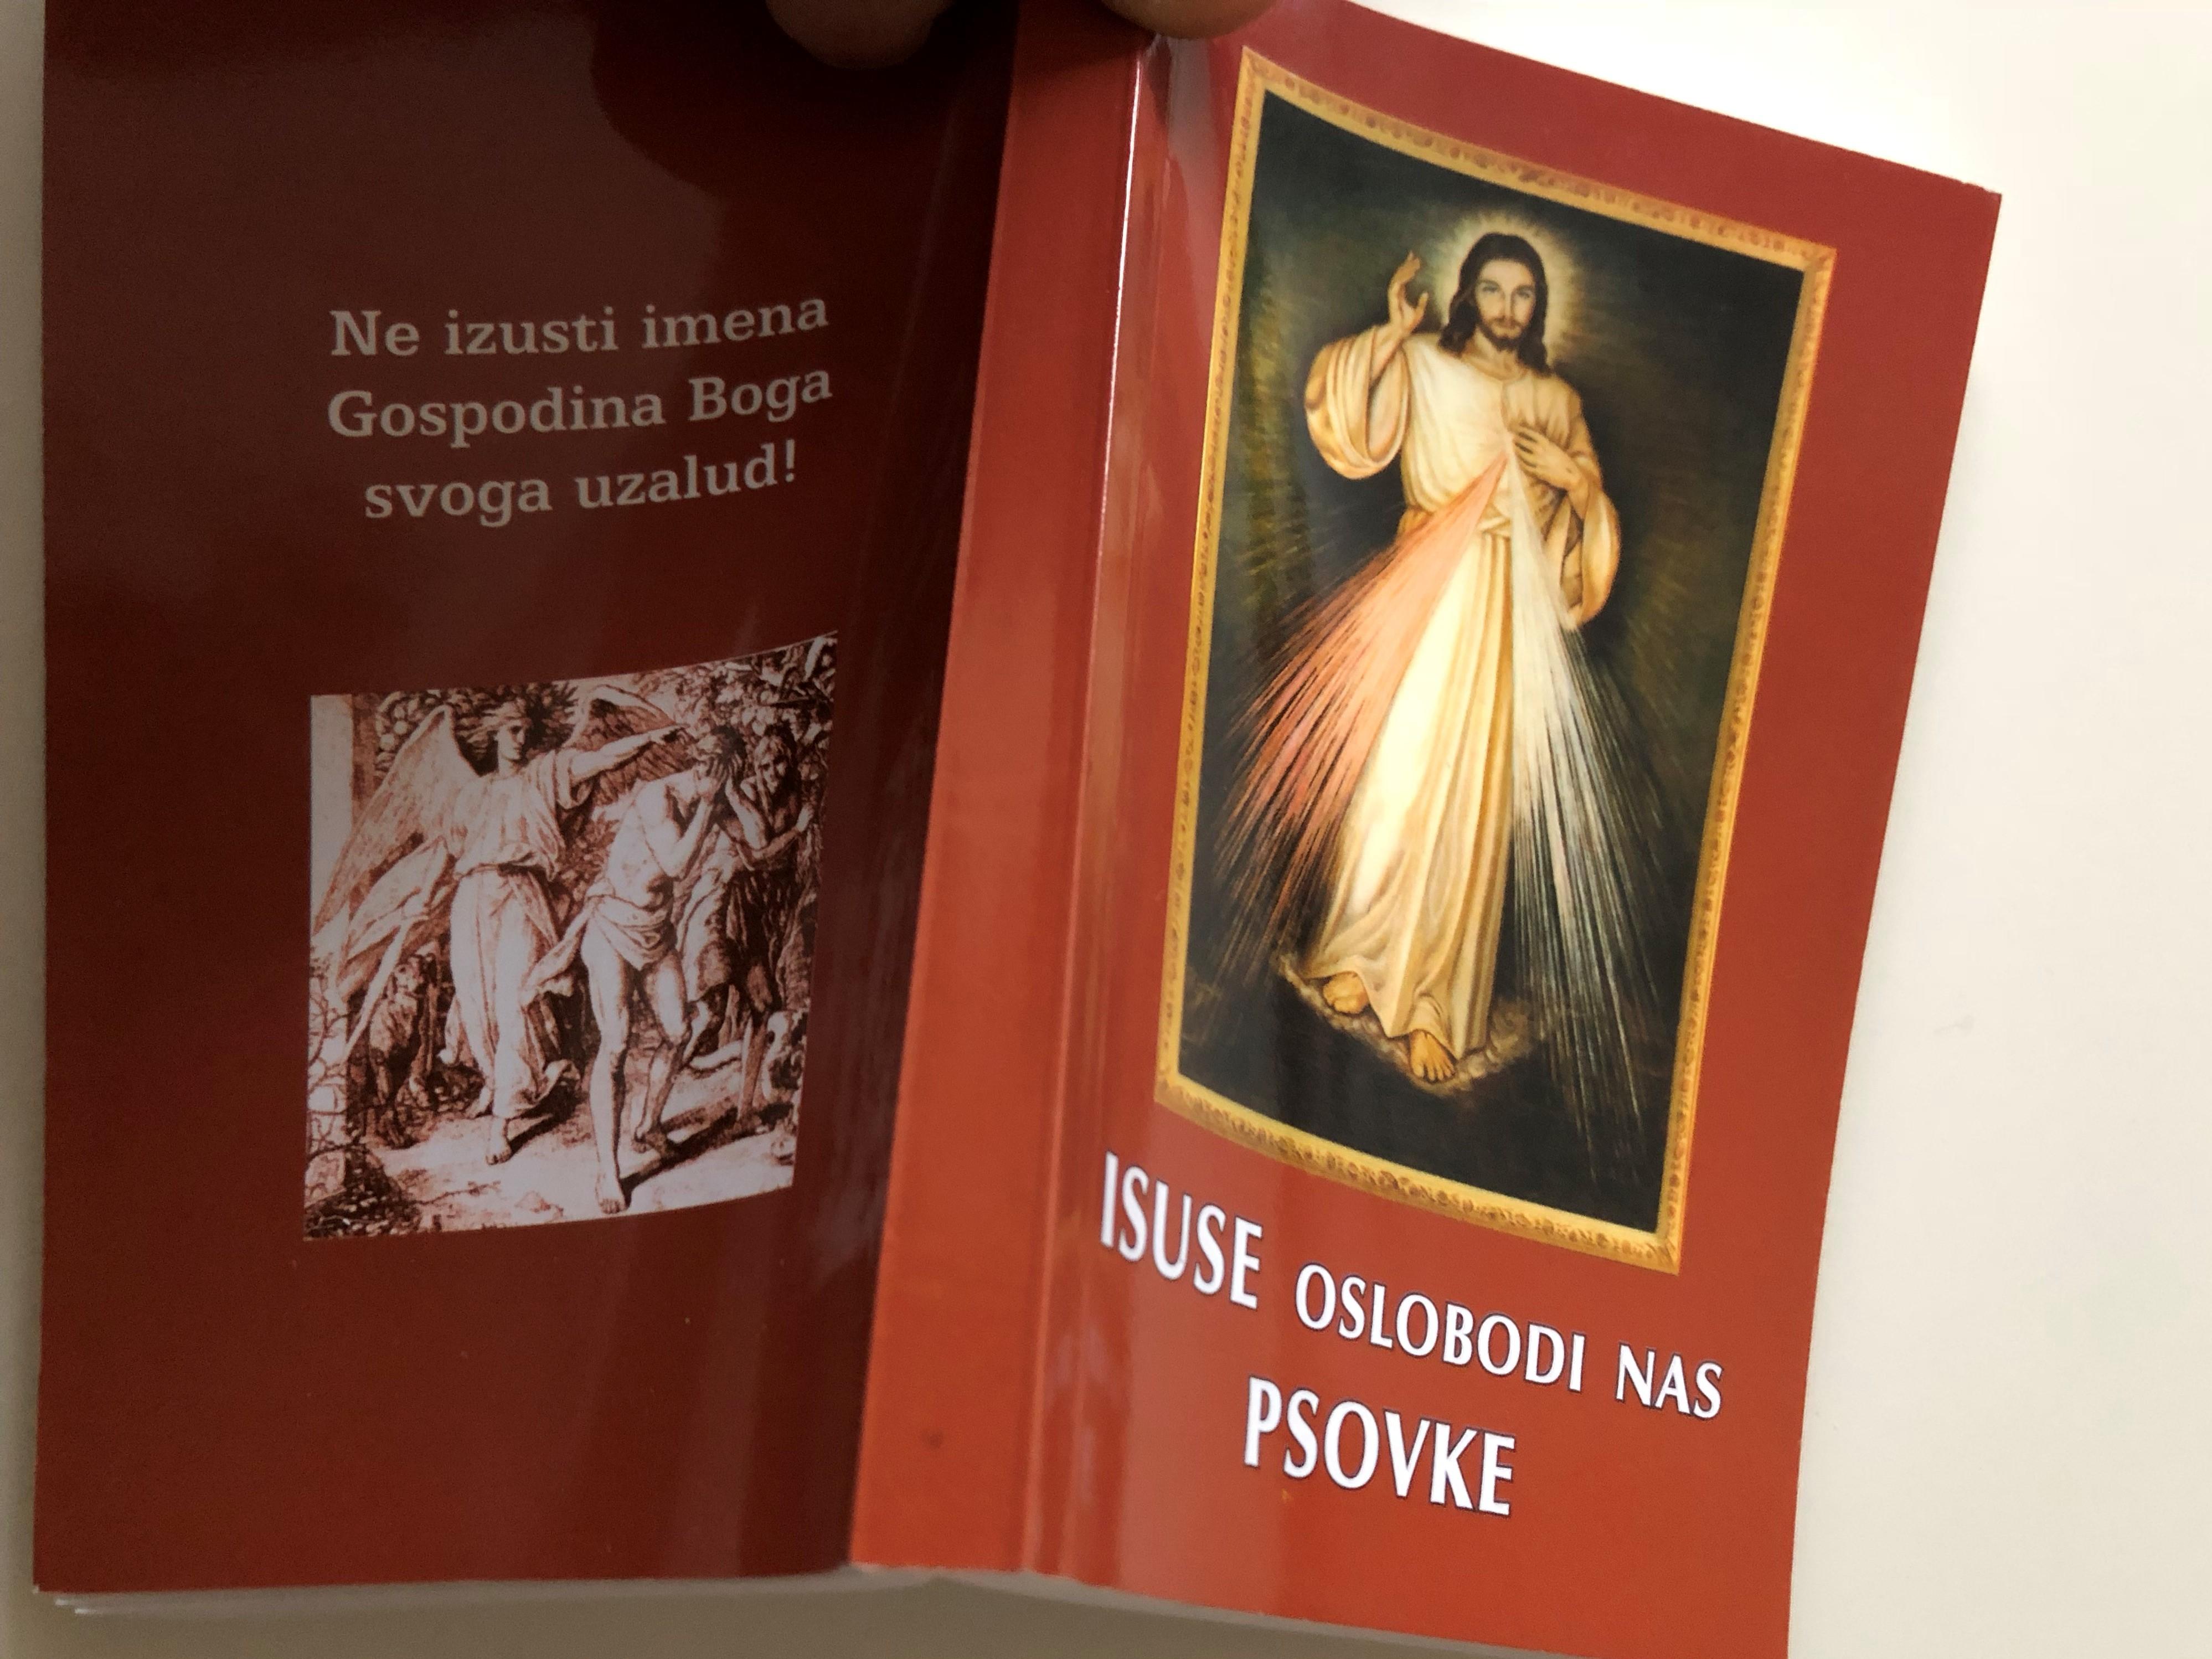 isuse-oslobodi-nas-psovke-jesus-set-us-free-from-cuss-words-croatian-language-prayerbook-help-to-those-struggling-with-swearing-2a-.jpg